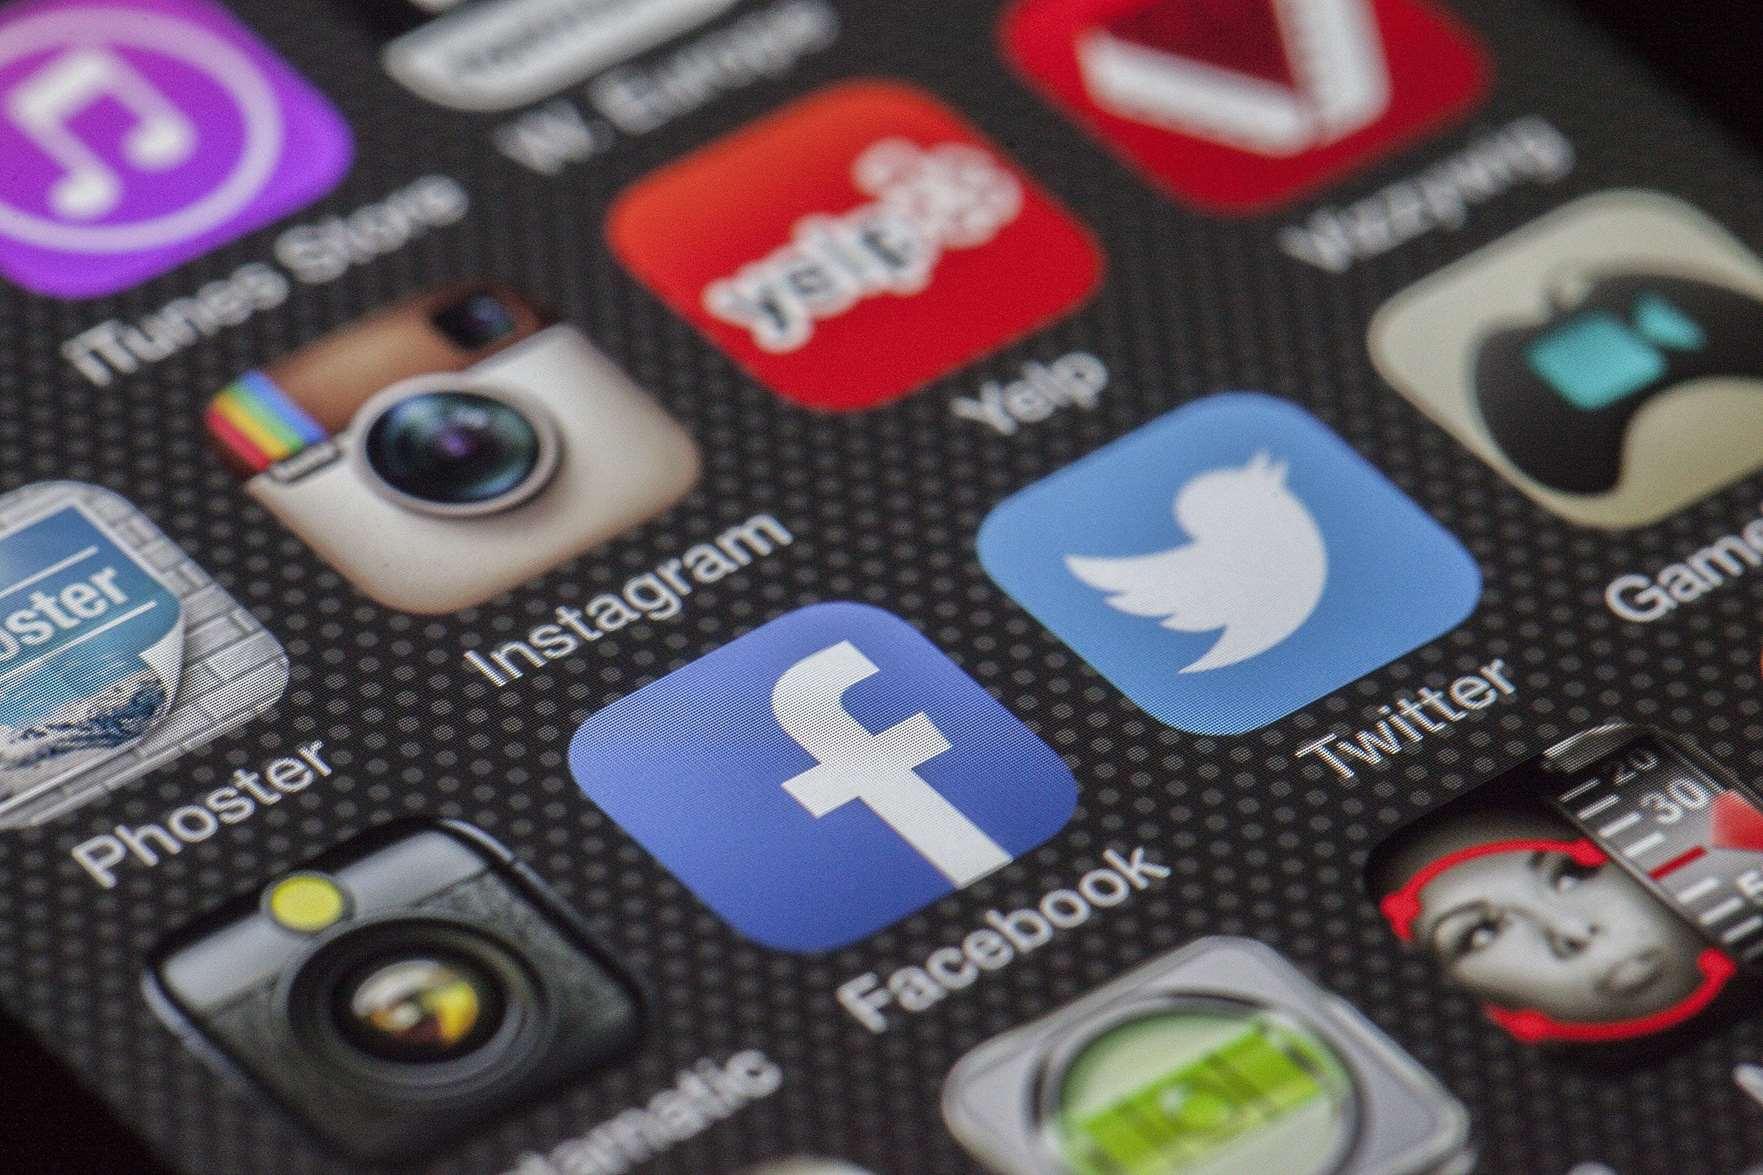 le app e l'e-commerce - copertina